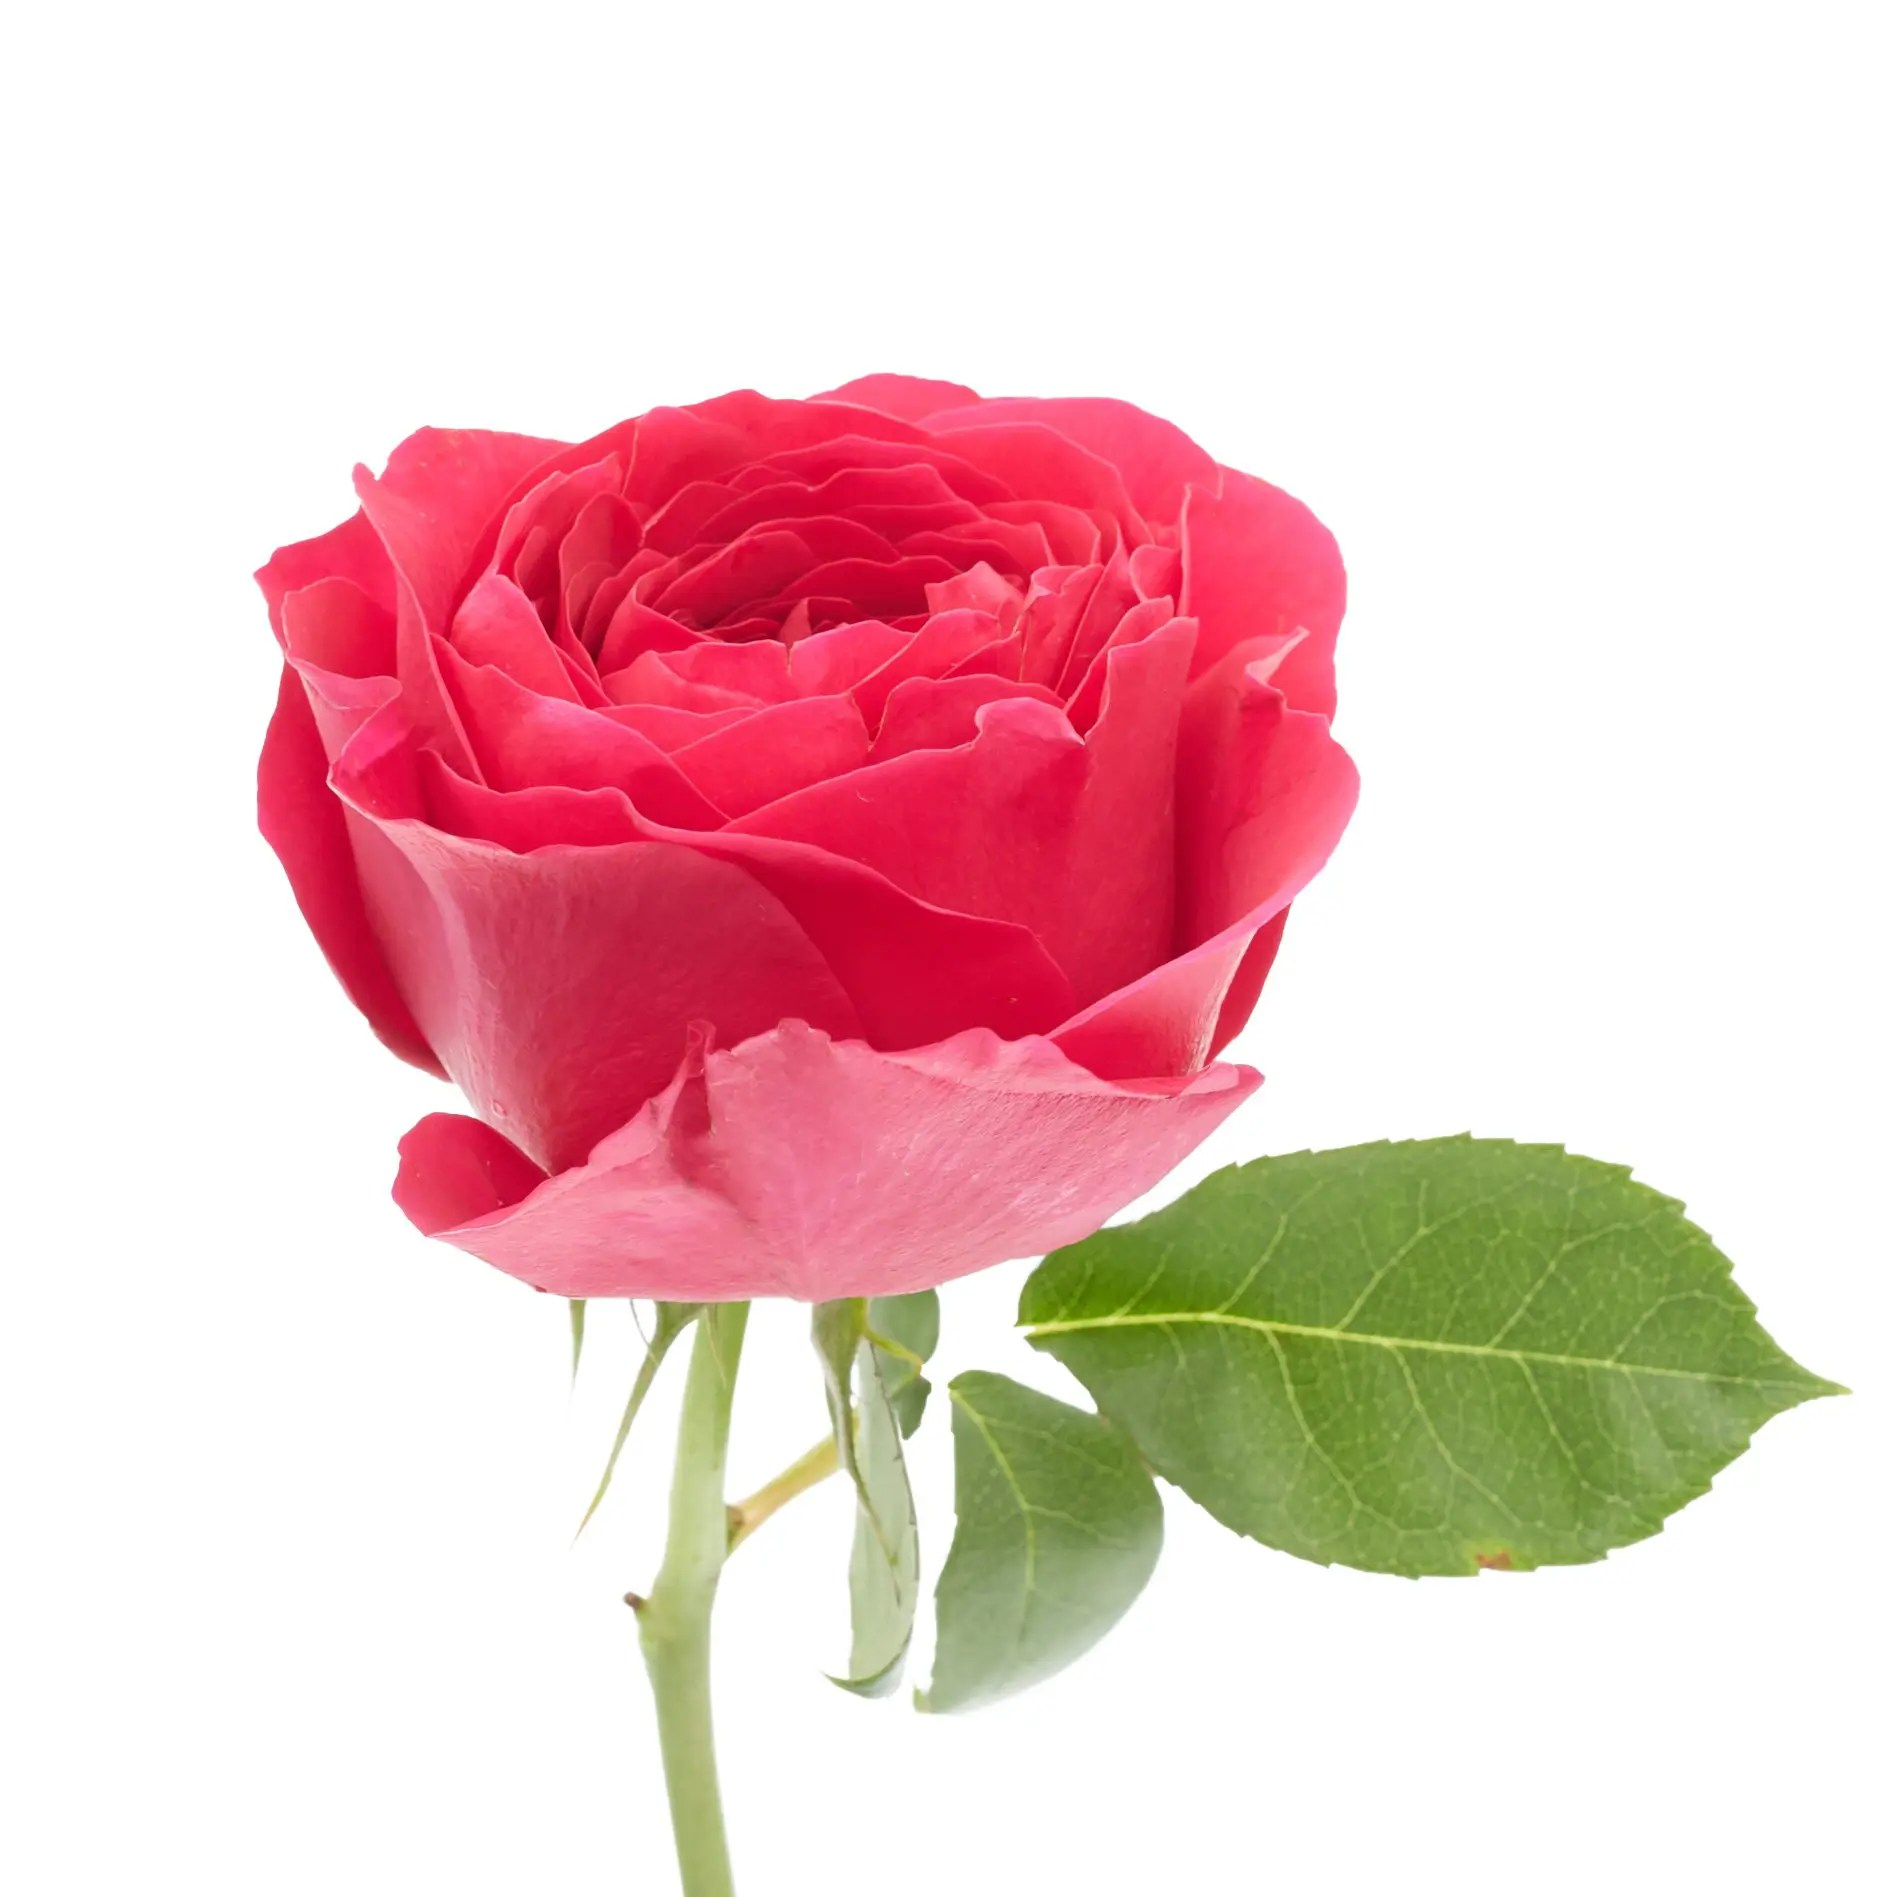 David Austin Roses0510